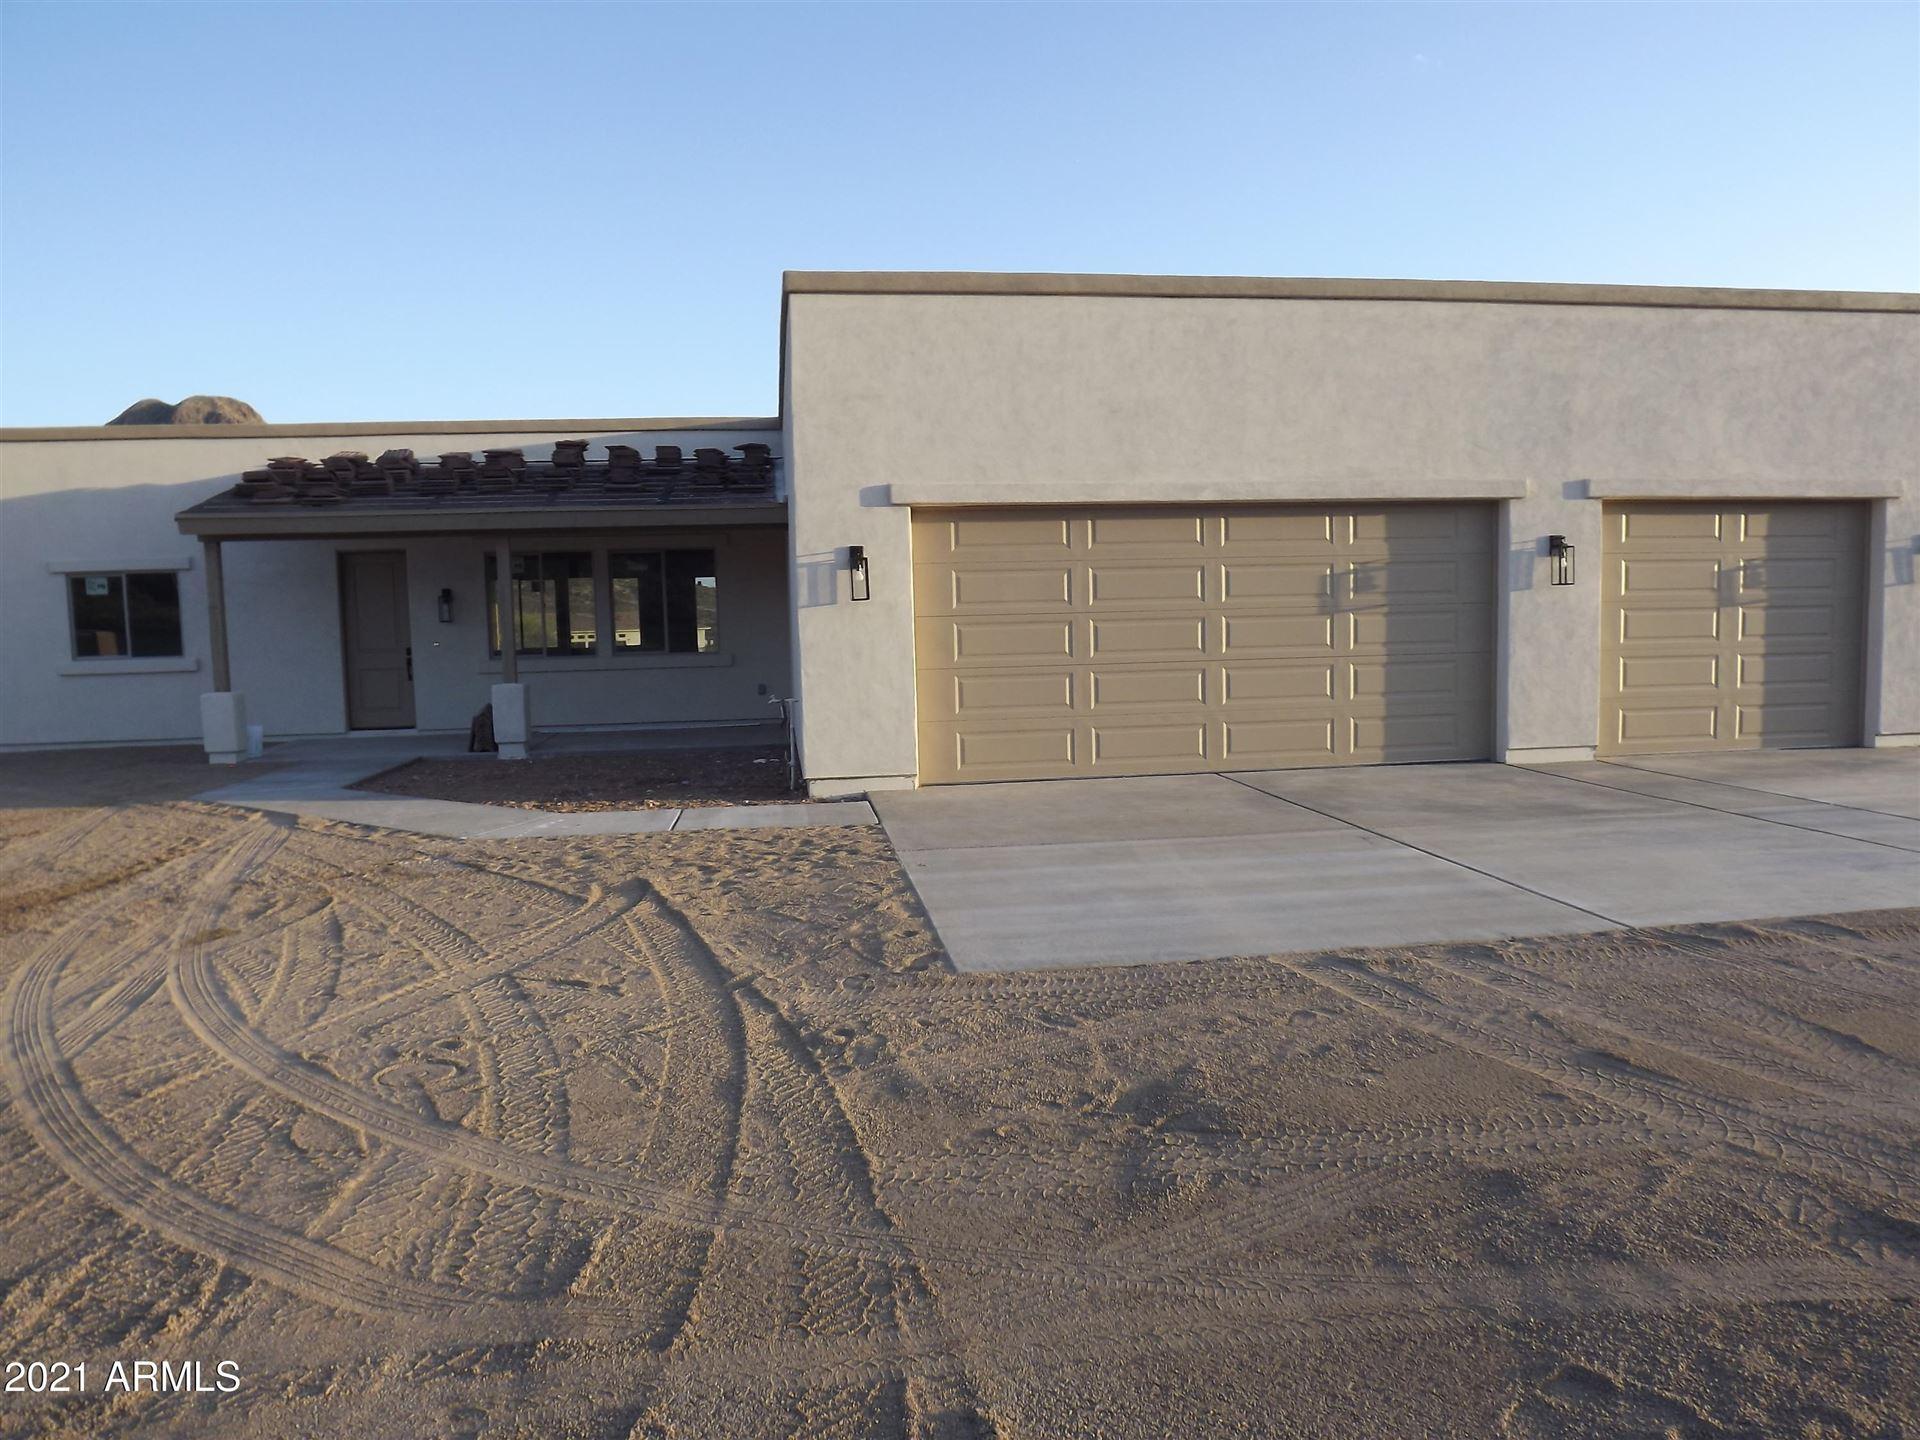 Photo of 48118 N COYOTE PASS Road, New River, AZ 85087 (MLS # 6245596)